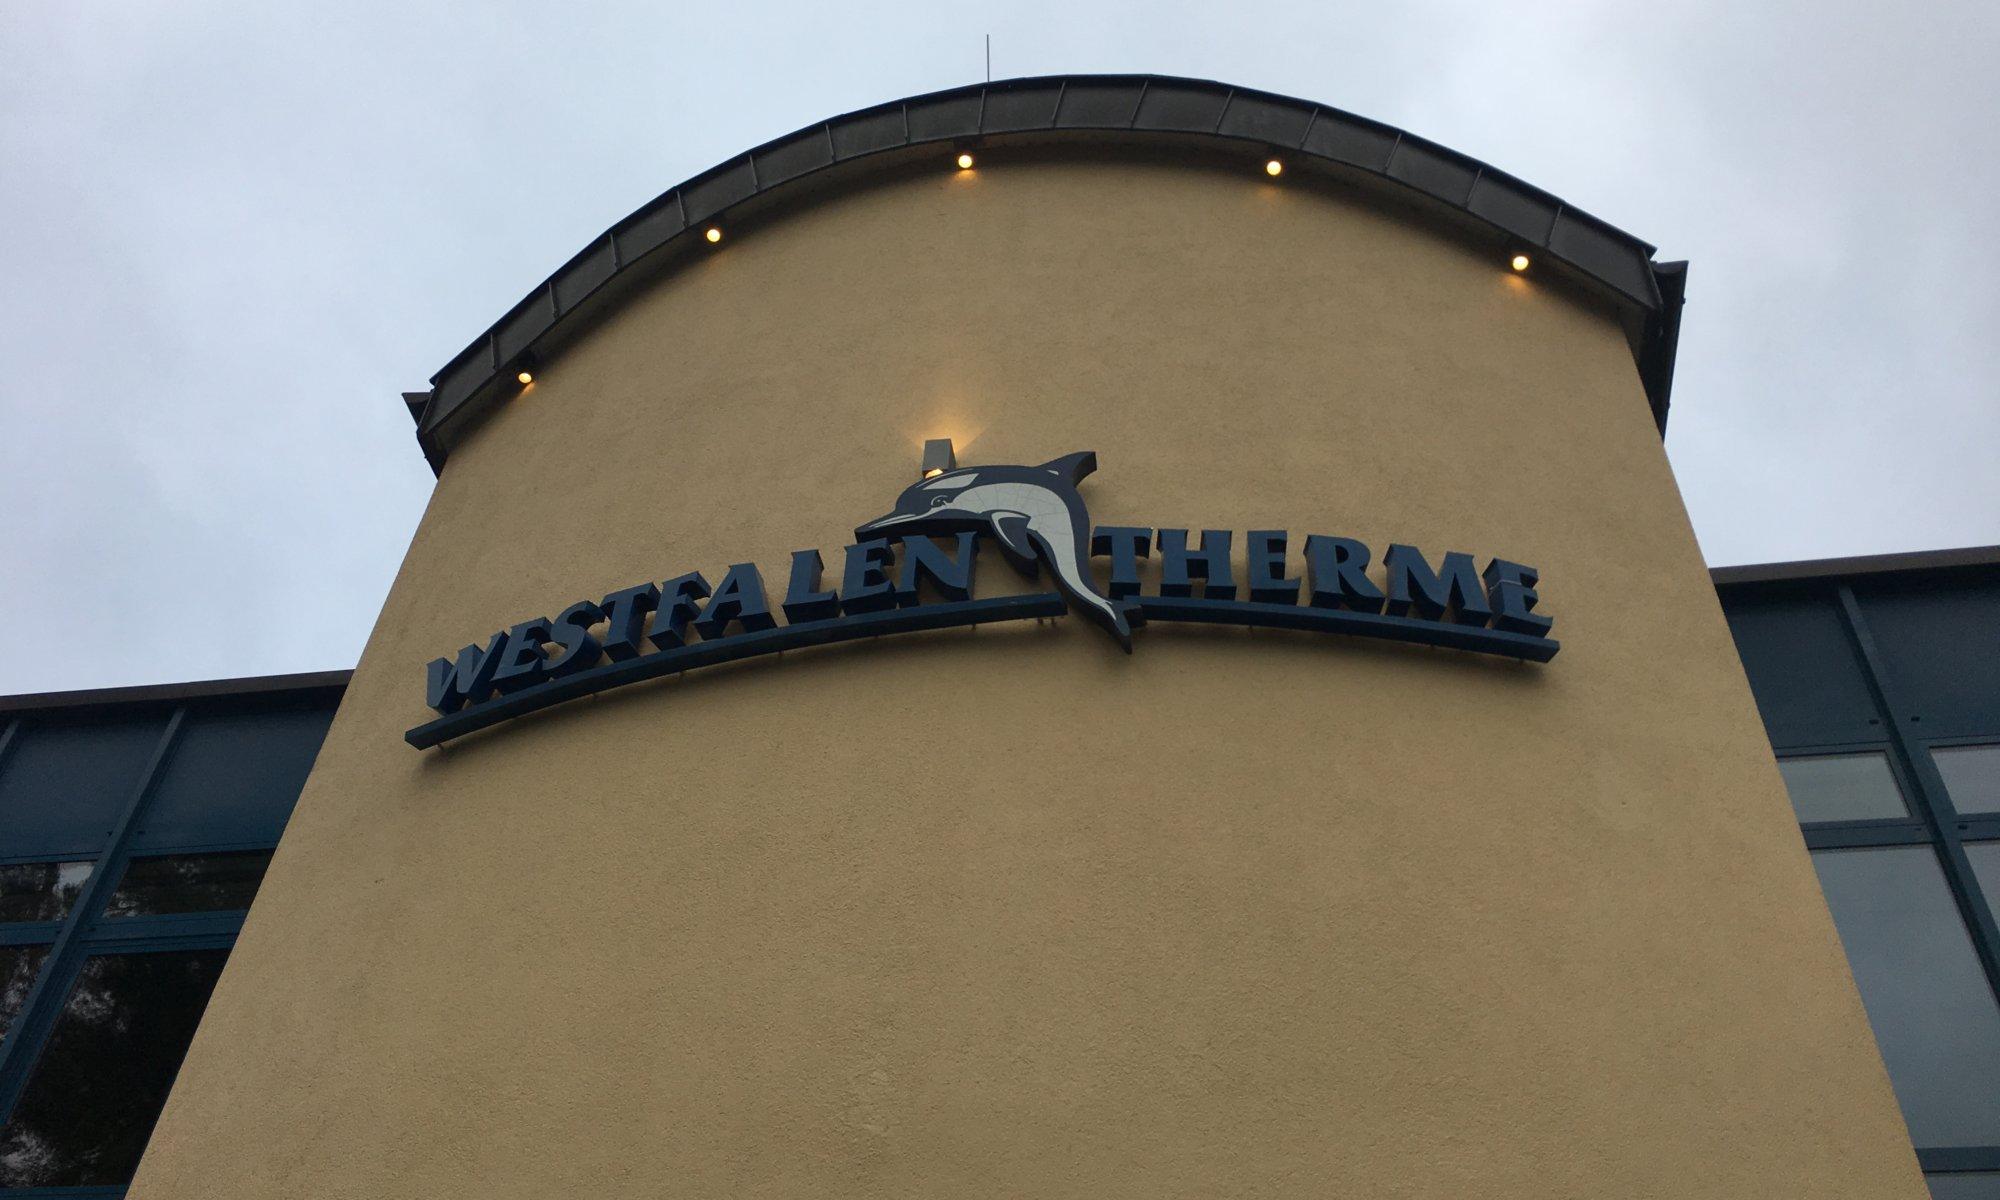 Westfalen-Therme, Bad Lippstadt